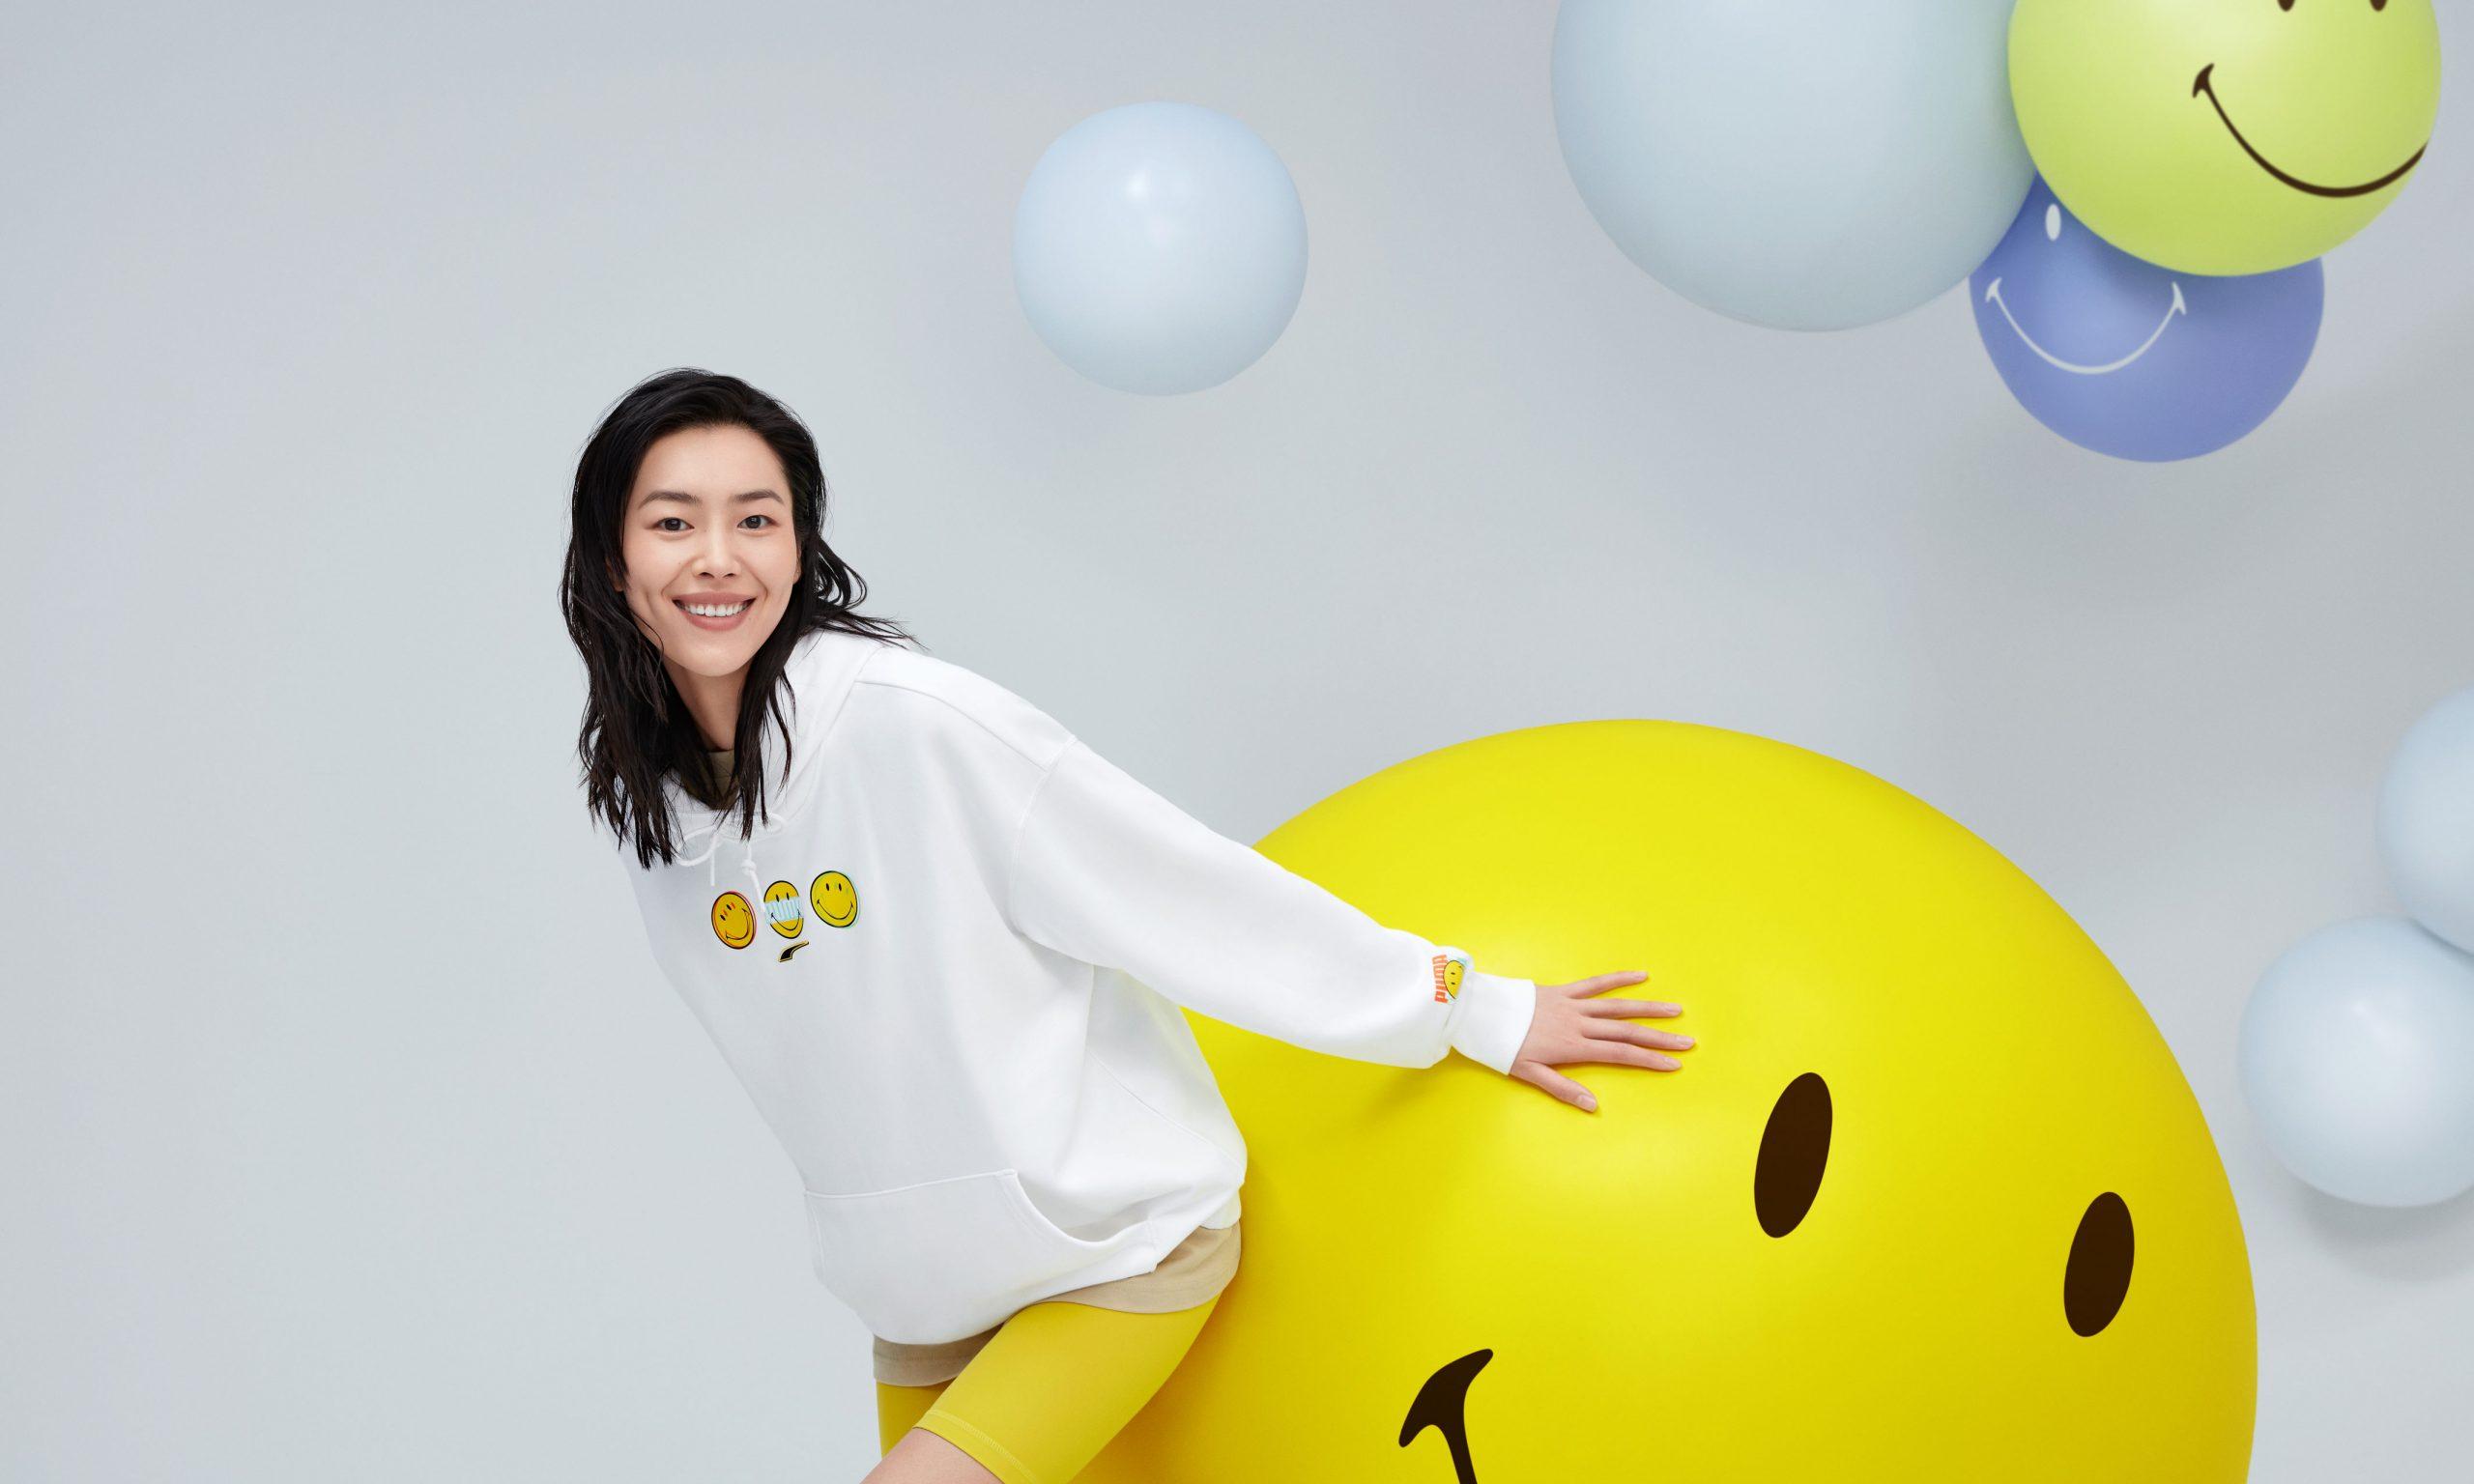 PUMA x SMILEY 联名系列即将发售